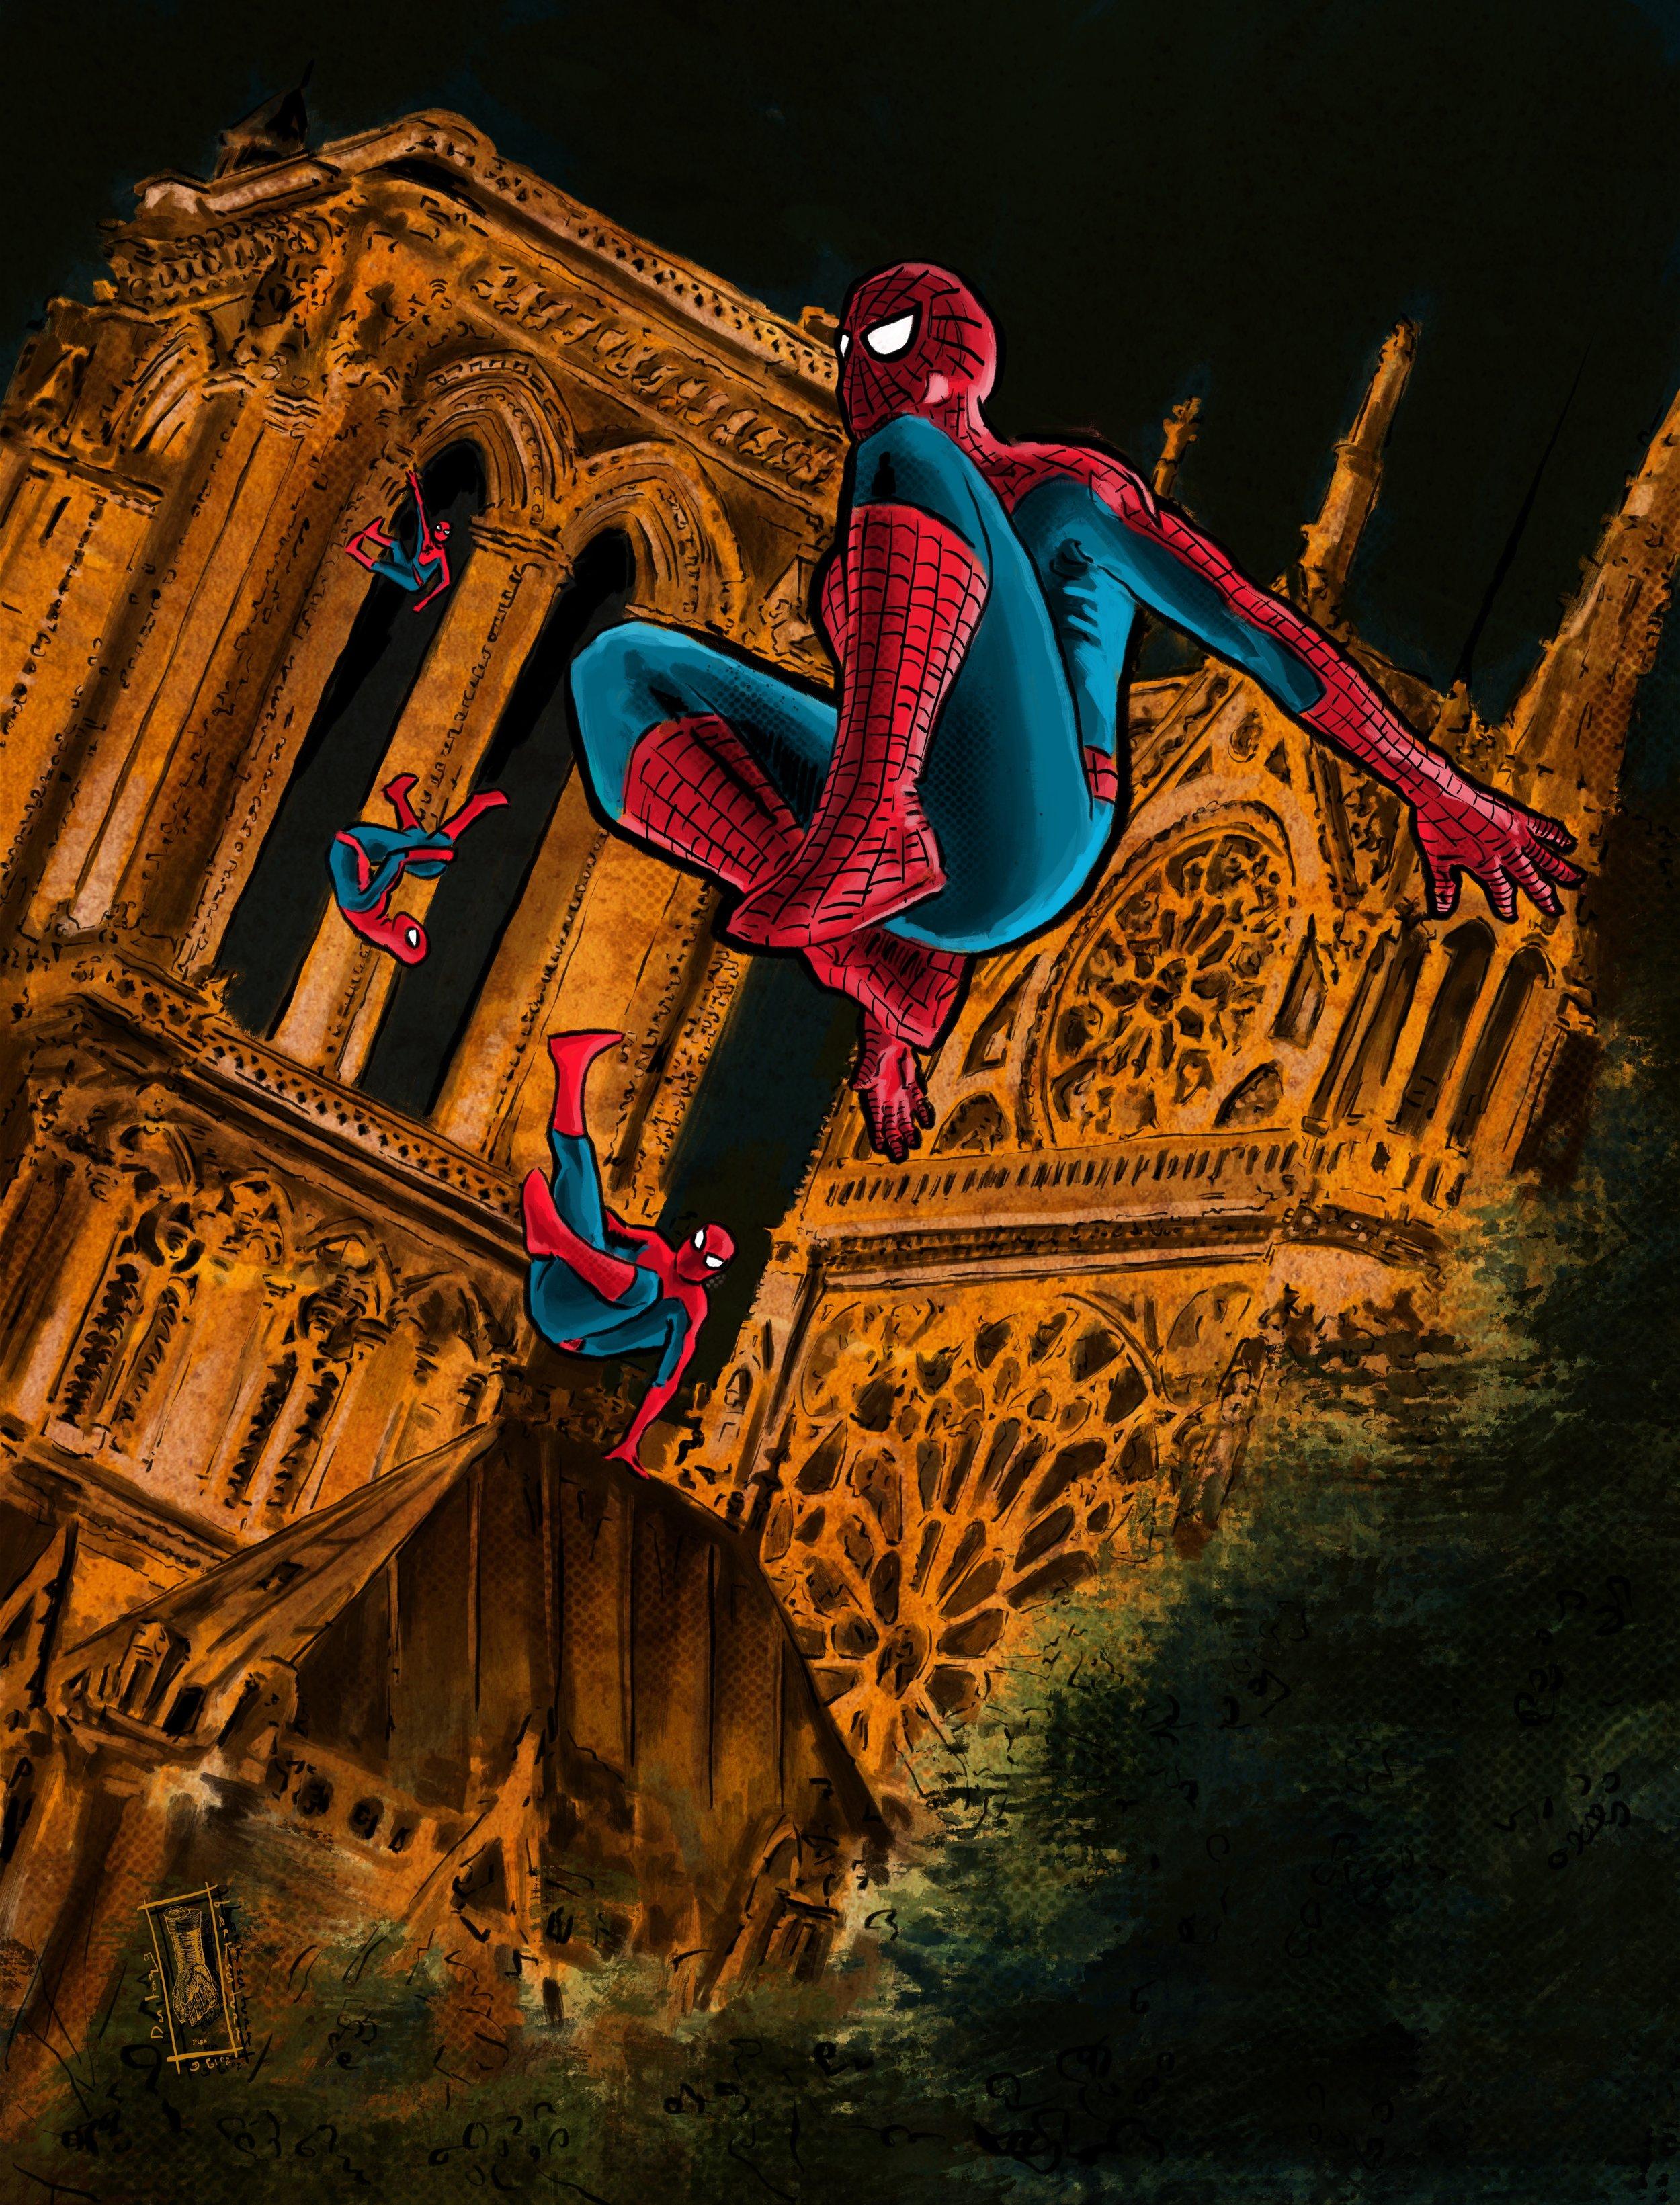 Paris_spiderman_berksenturk.JPG